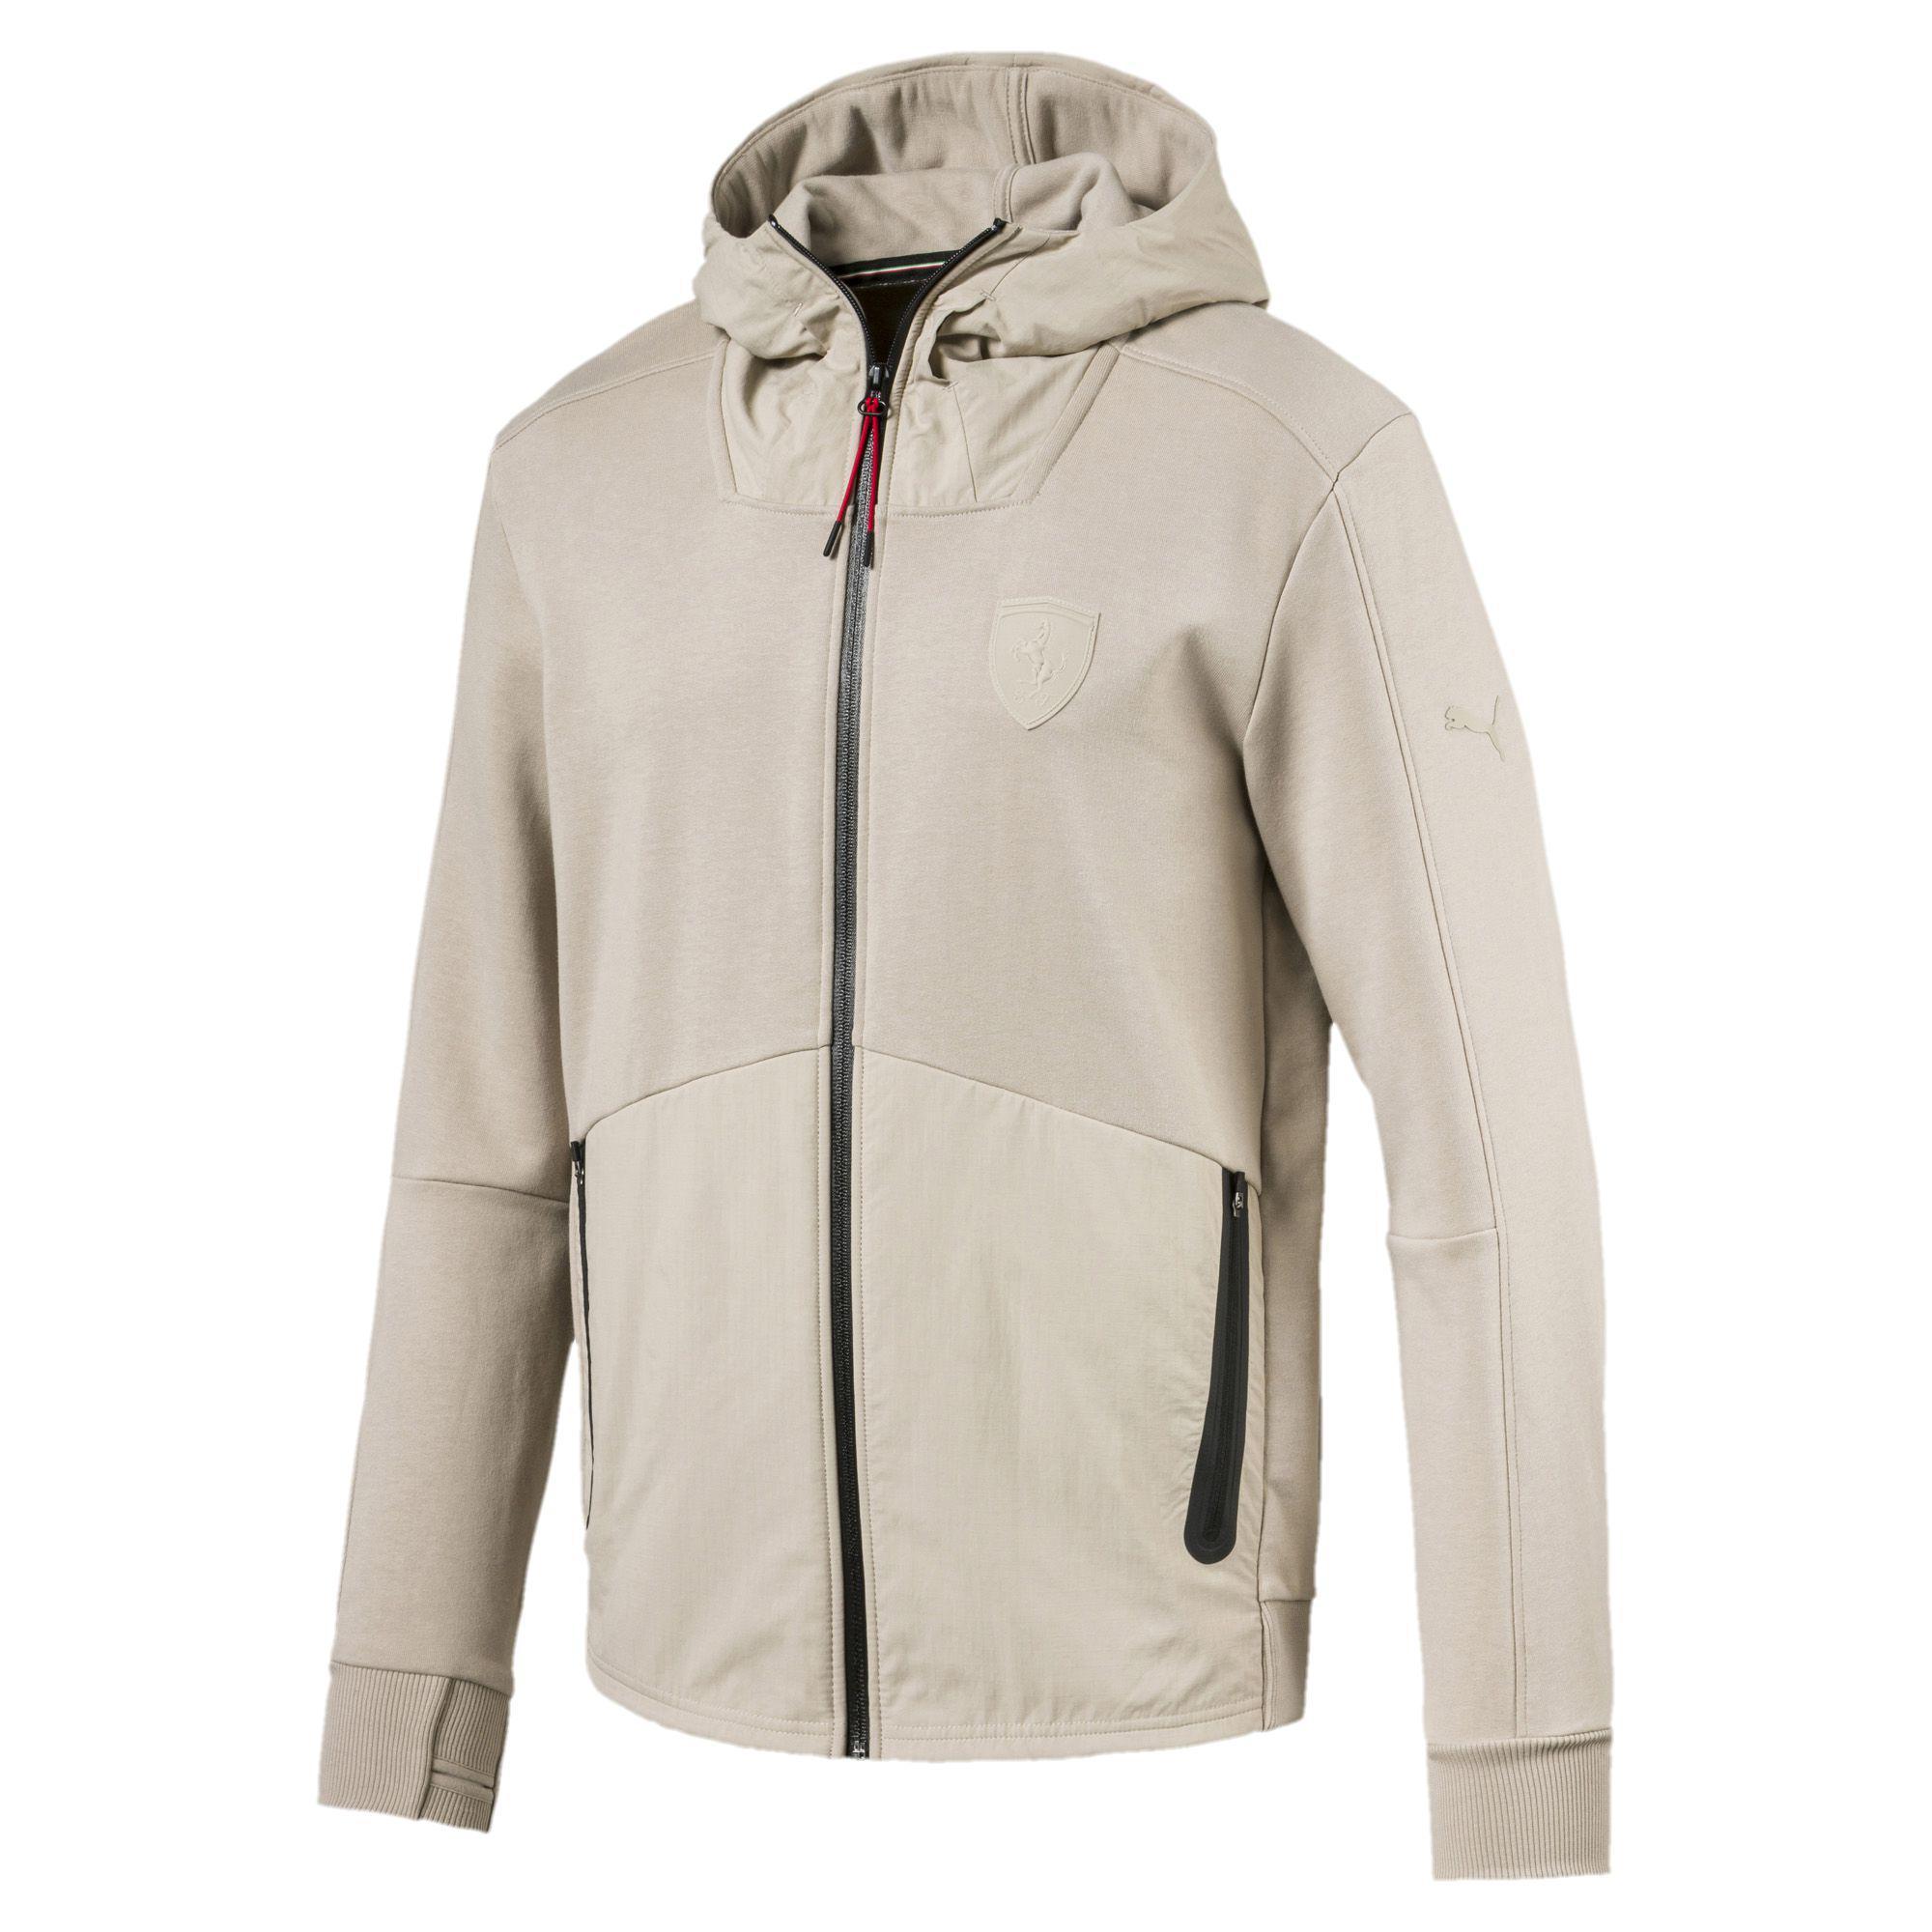 cheap fog jacket ferrari lrg men sleeve clothing p moonless night sale goalkeeper jersey black short track puma blue